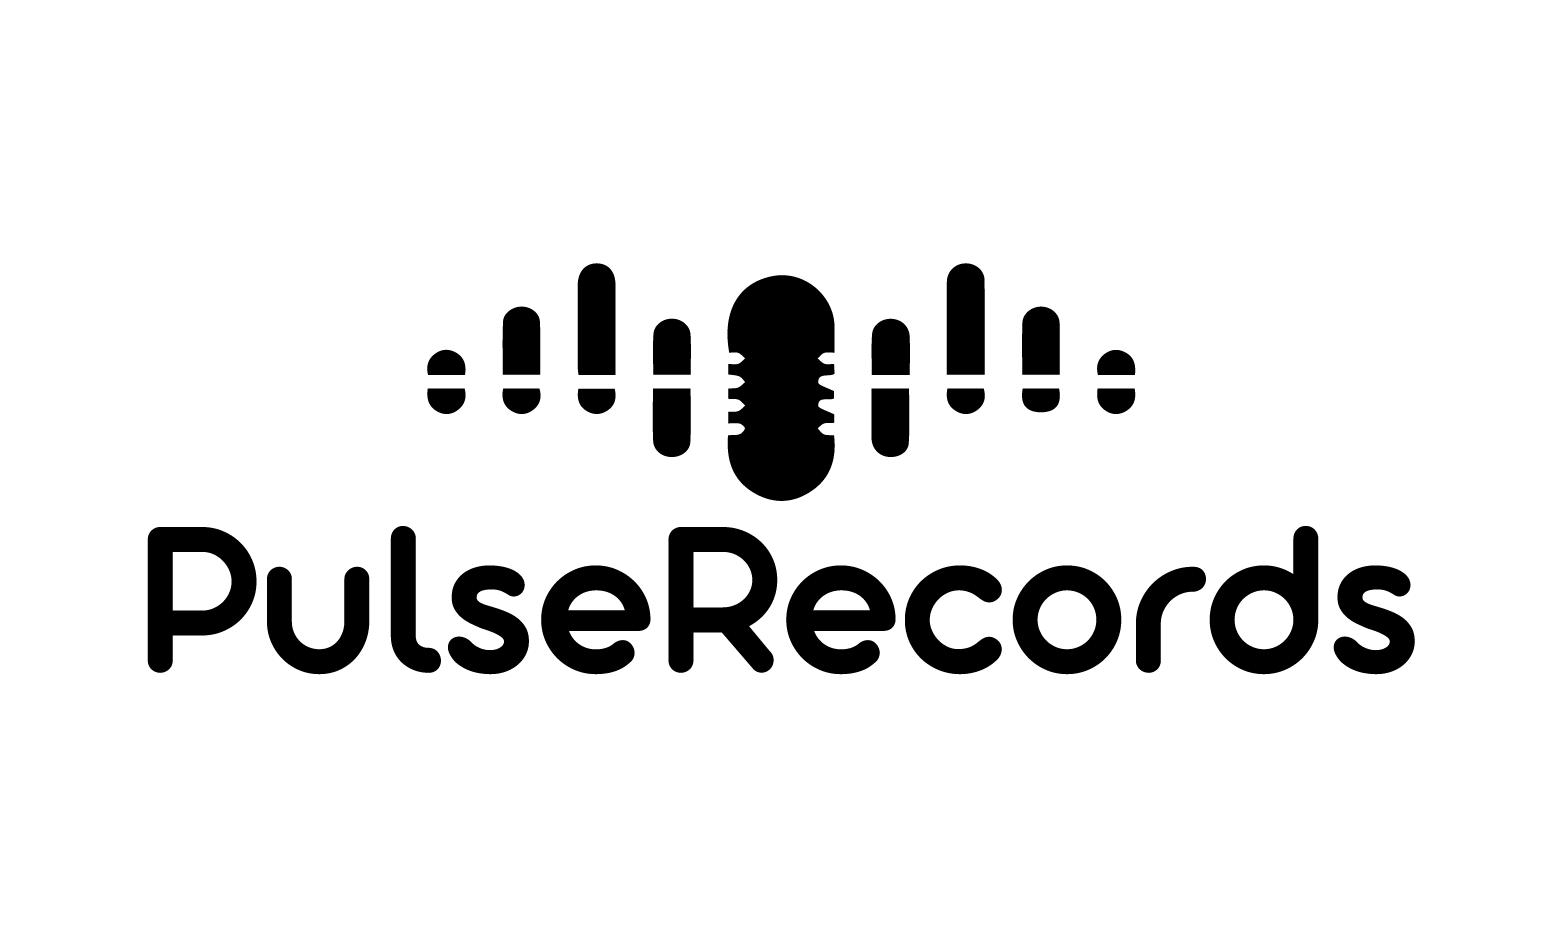 PulseRecords.com